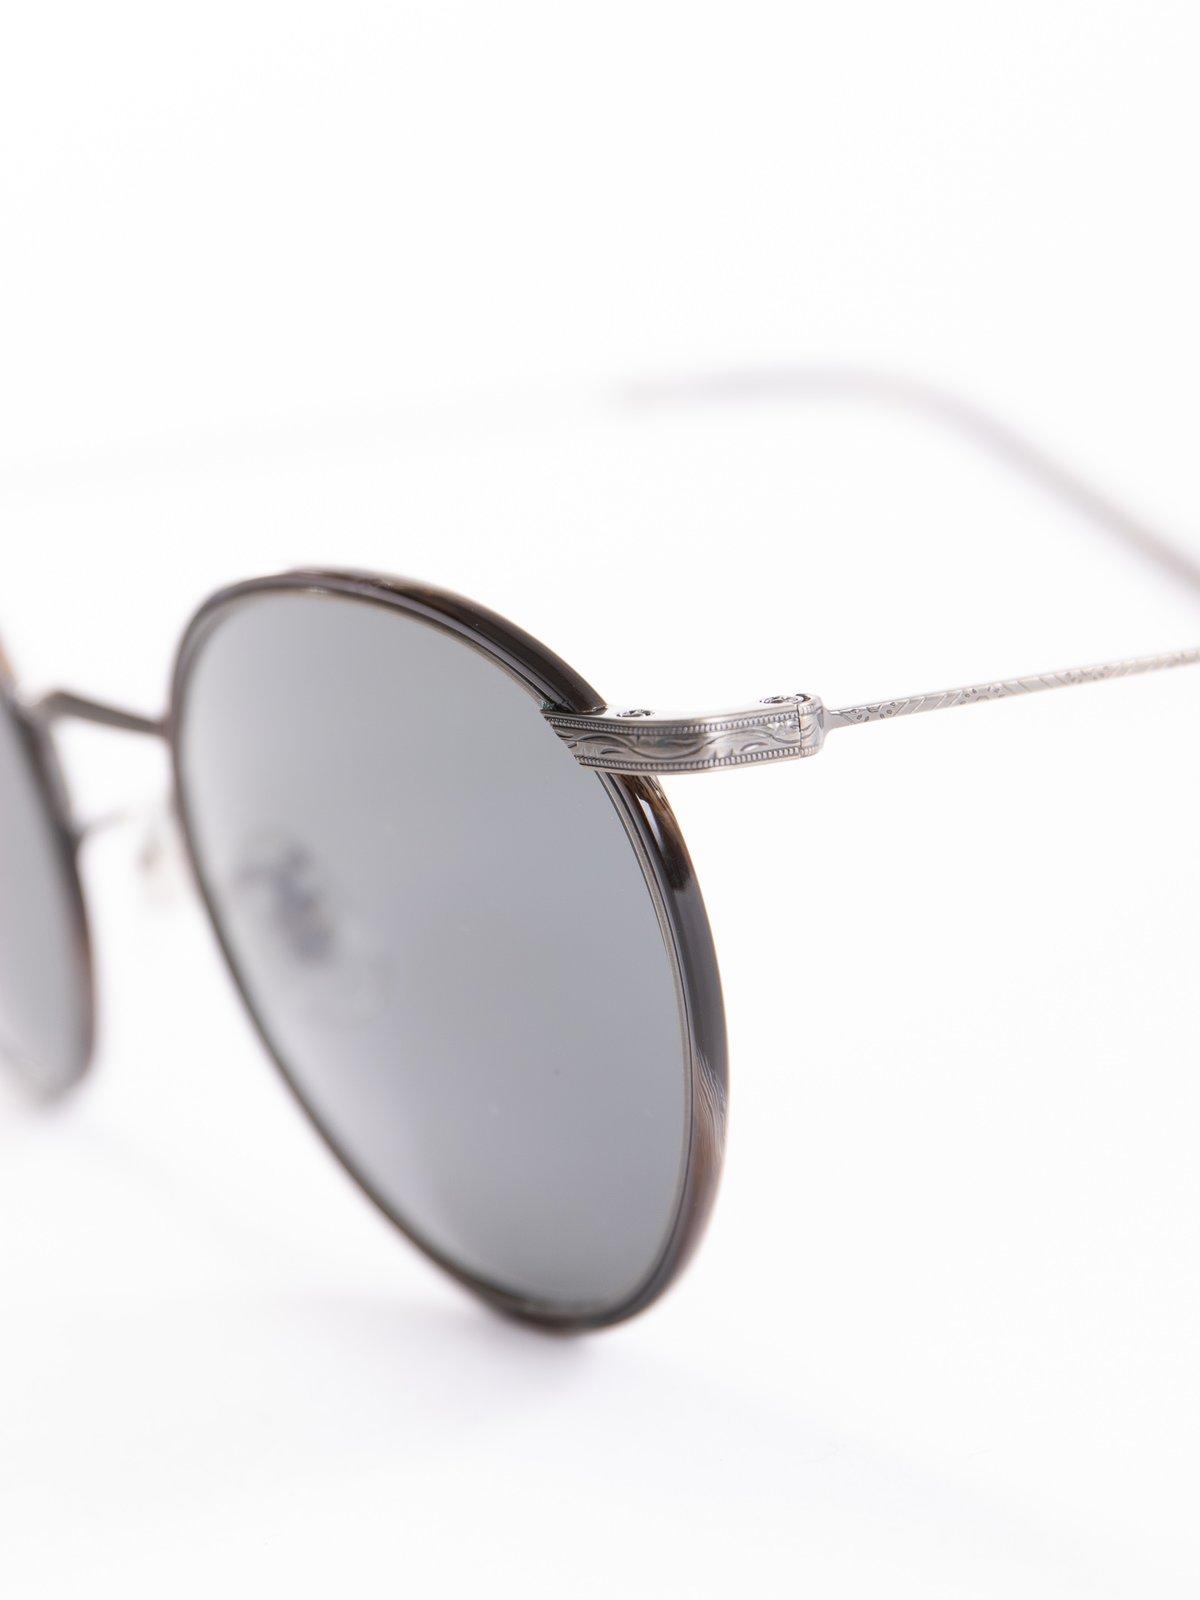 Pewter–Black Horn/Carbon Grey Casson Sunglasses - Image 3